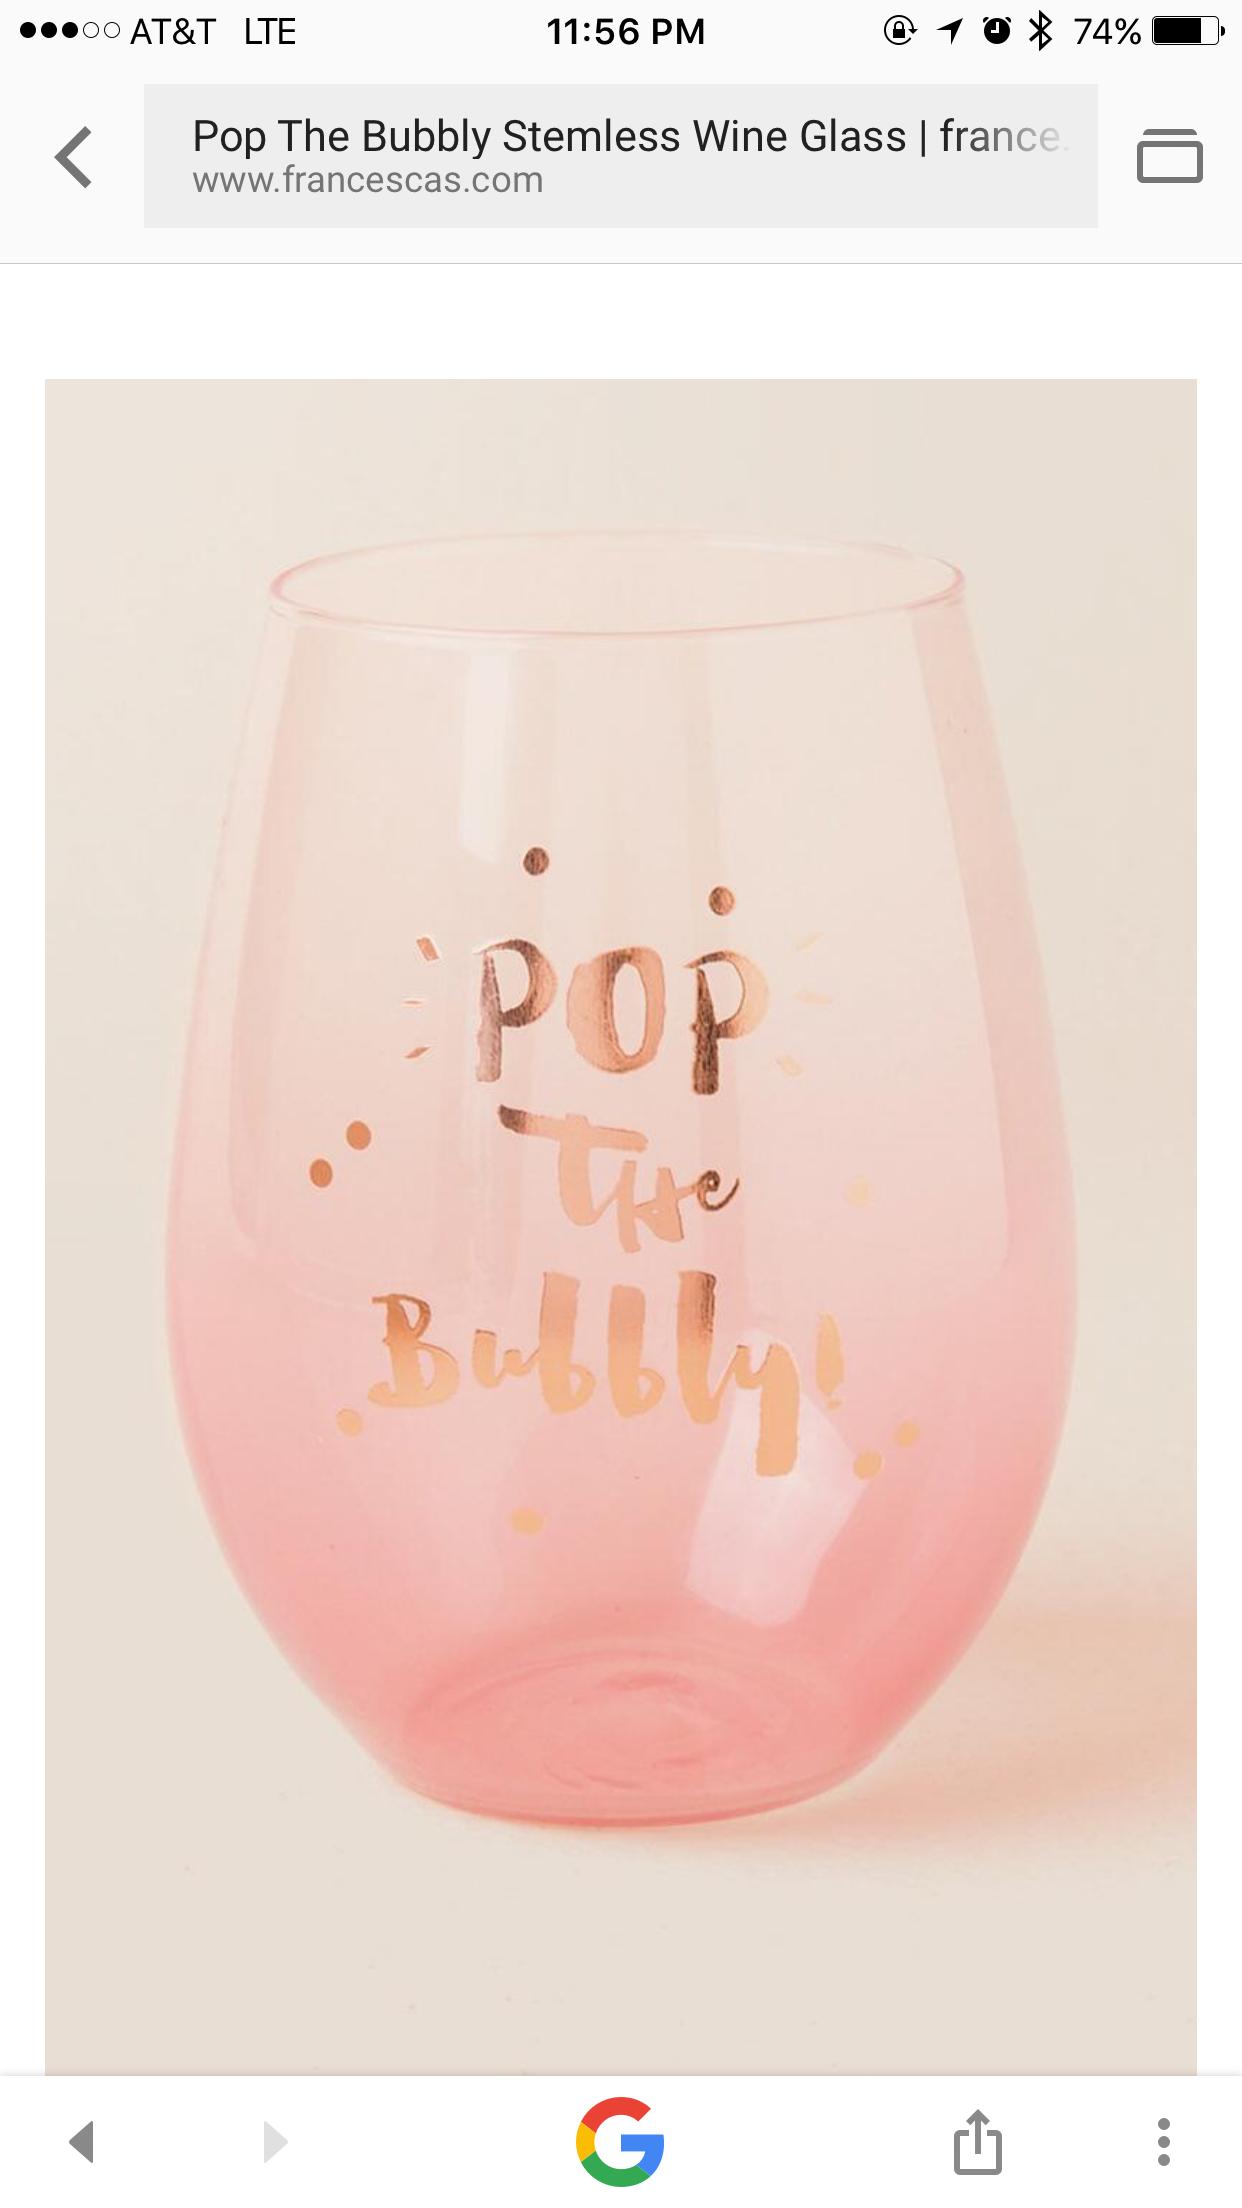 Pop Champagne Wine Glass Stemless Wine Glass Pop Champagne